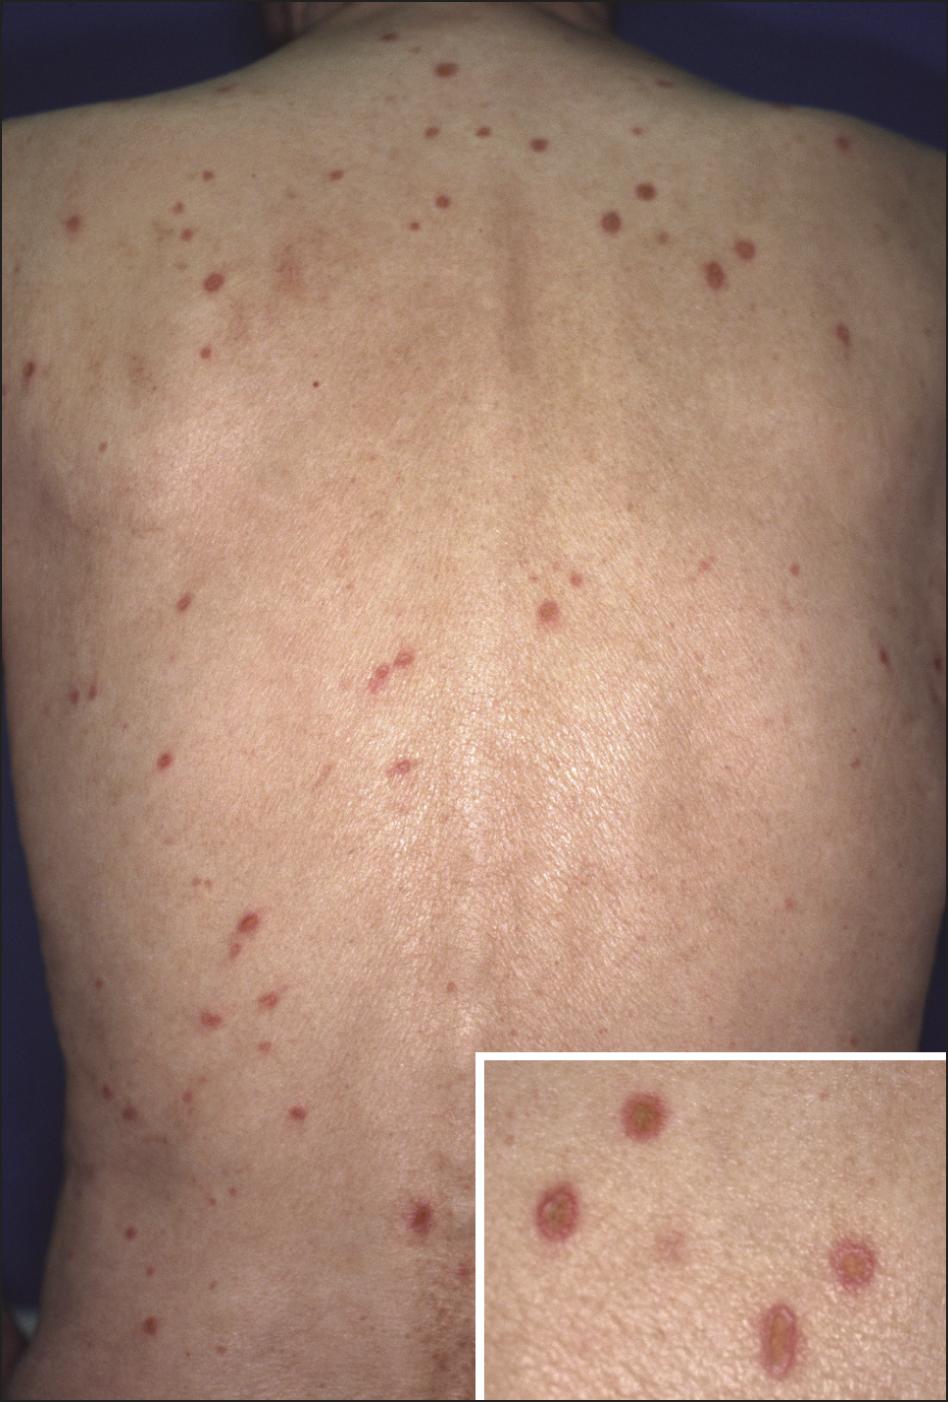 Cytomegalovirus